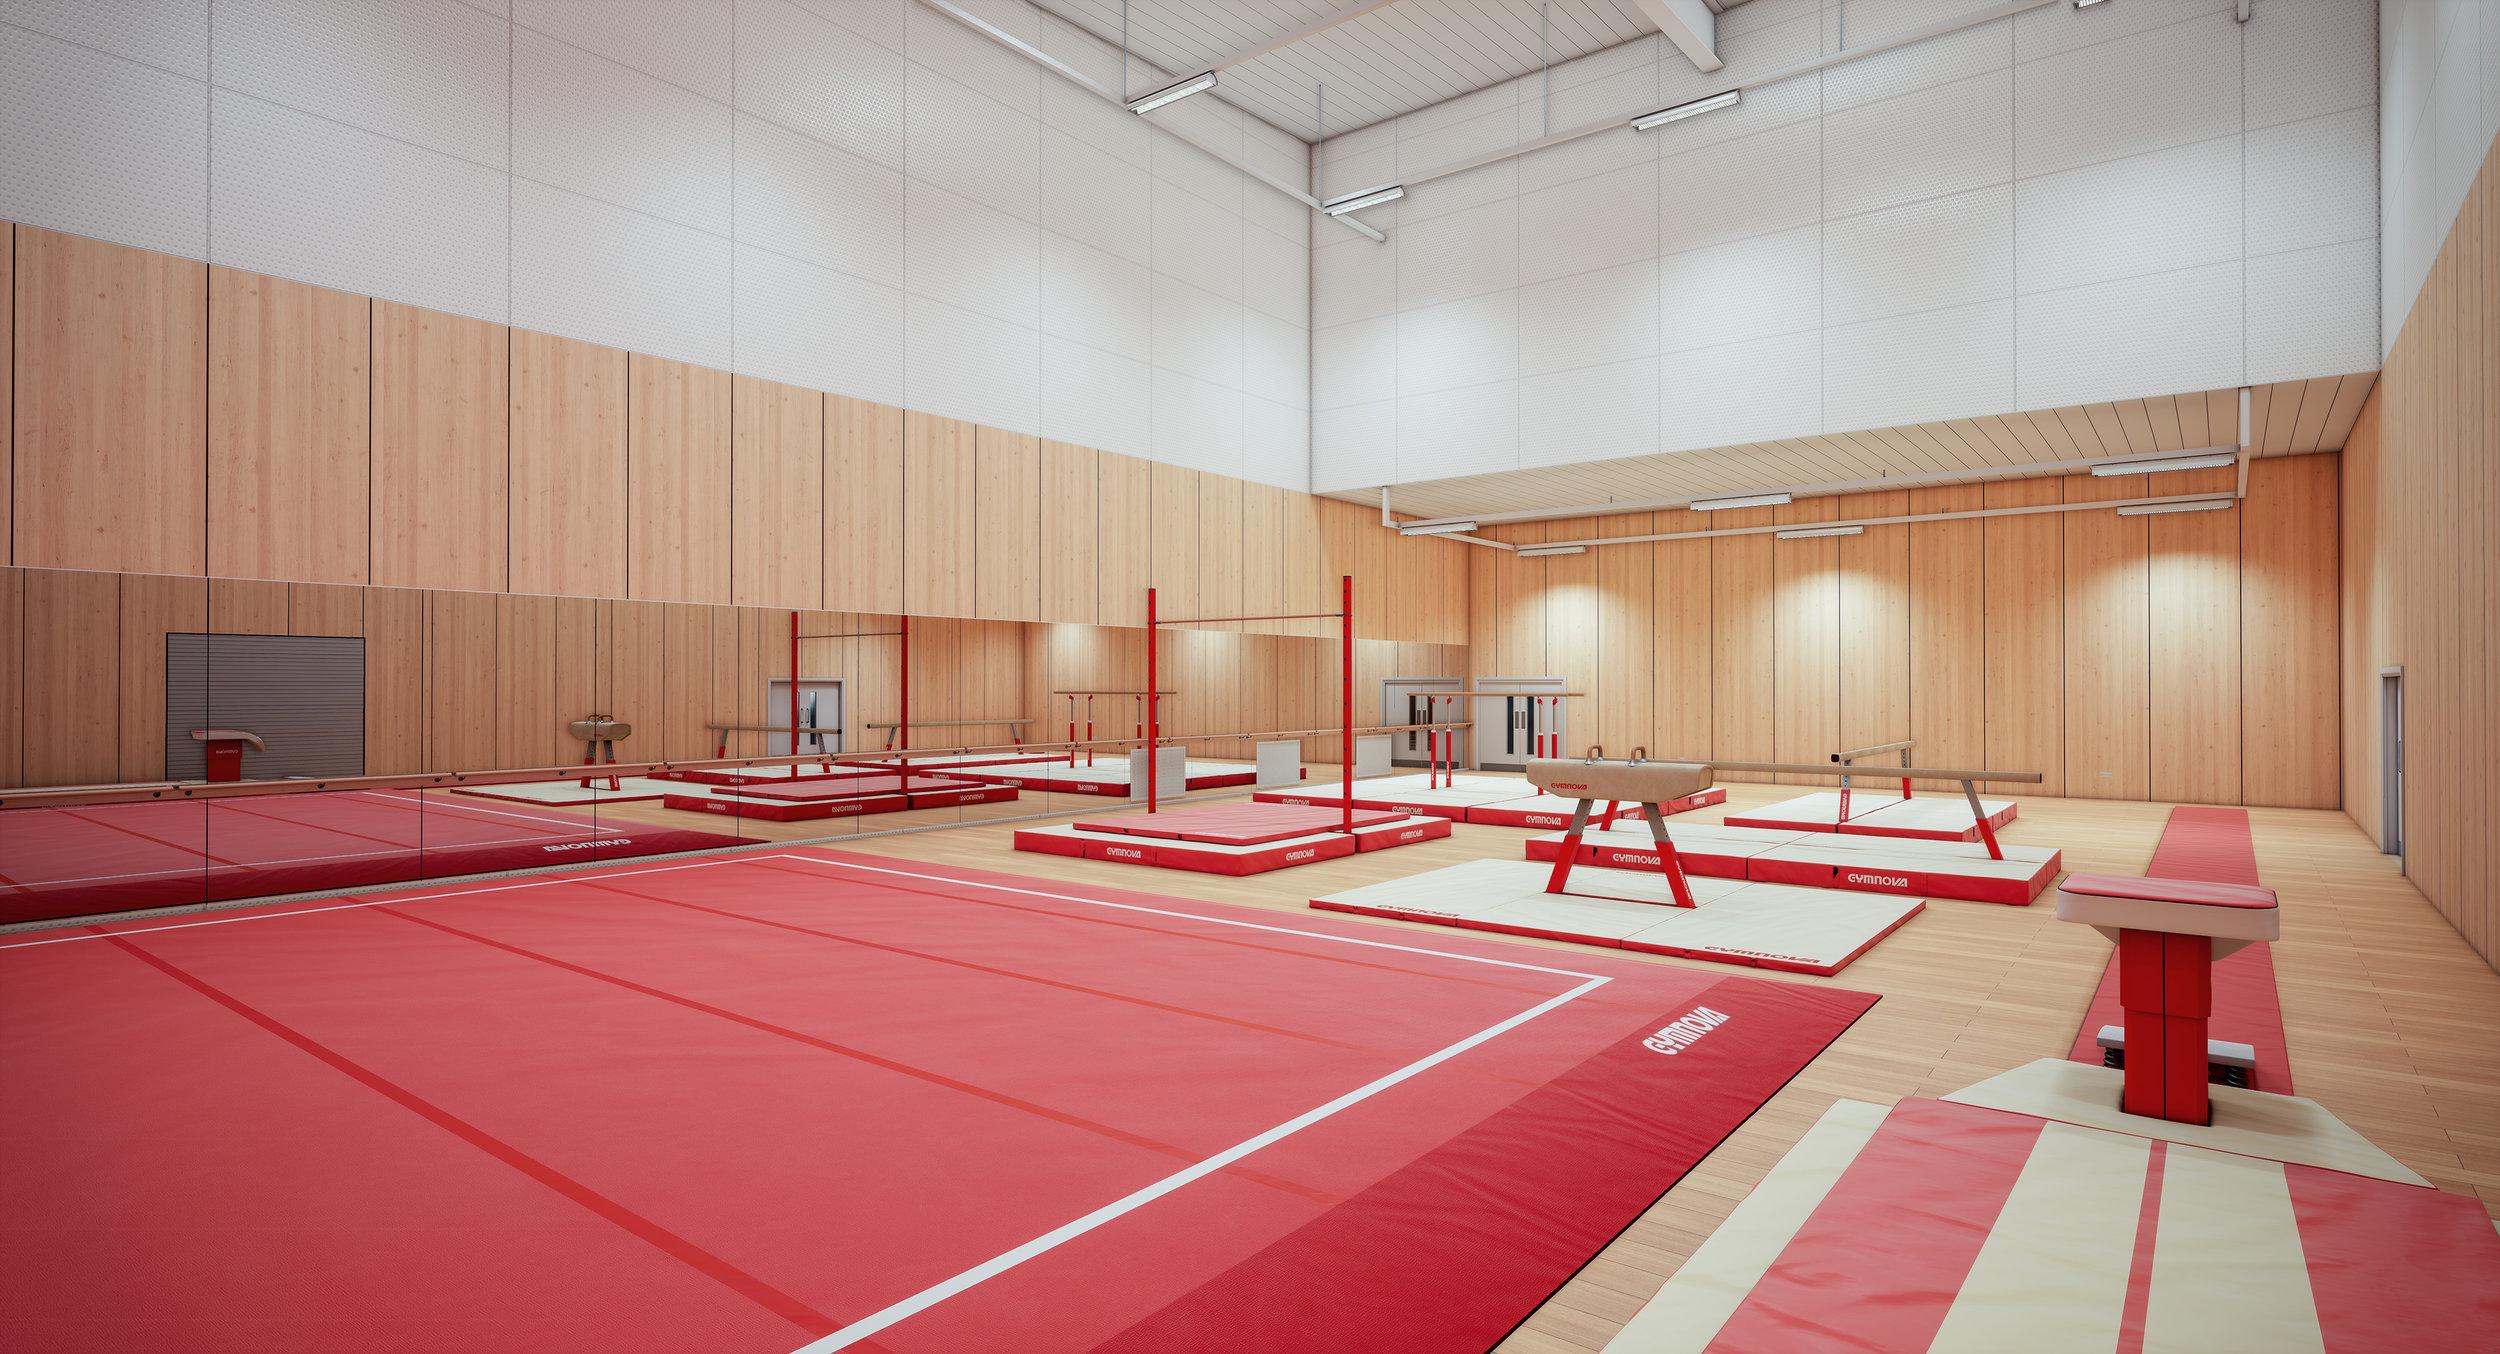 18_0015_VL_Meadowbank_Gymnastics_13thDec2018.jpg